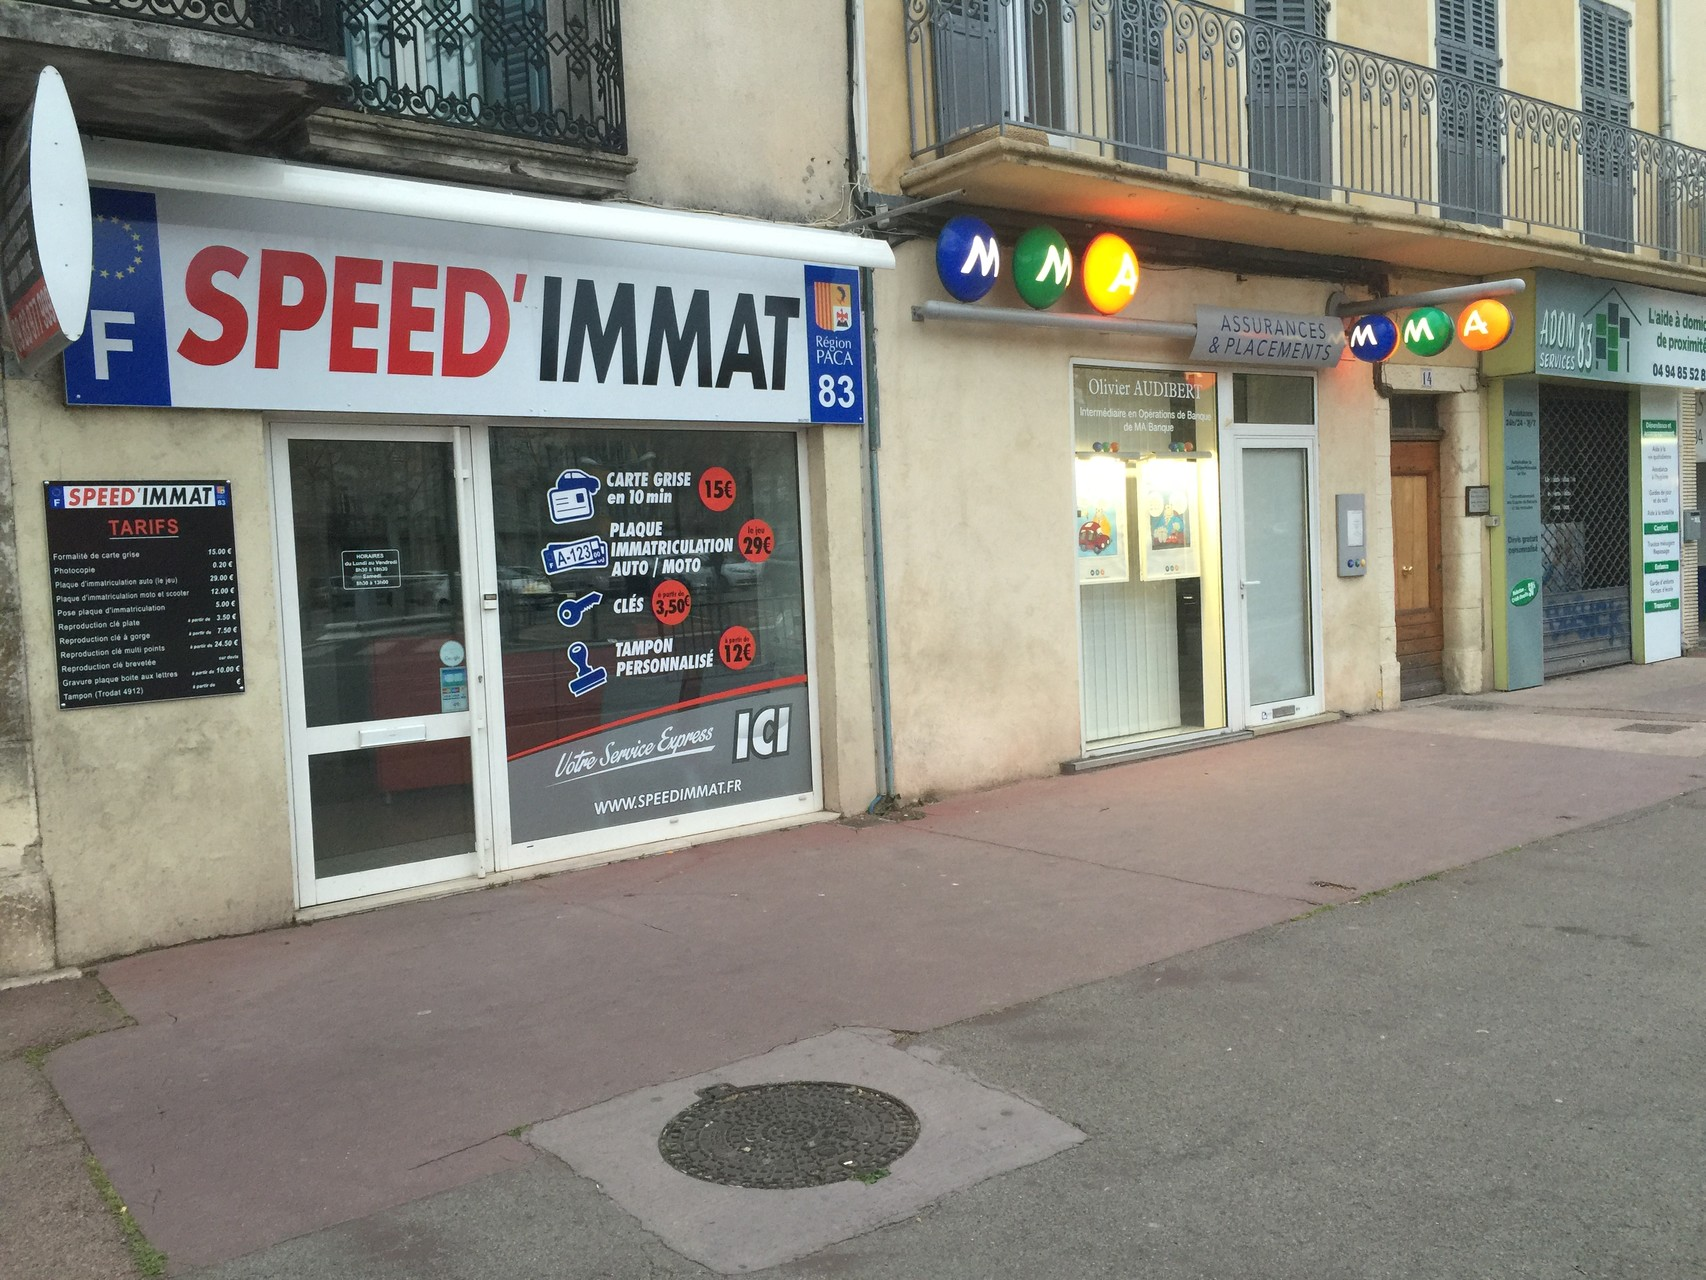 Carte Grise Speed Immat Carte Grise A Draguignan